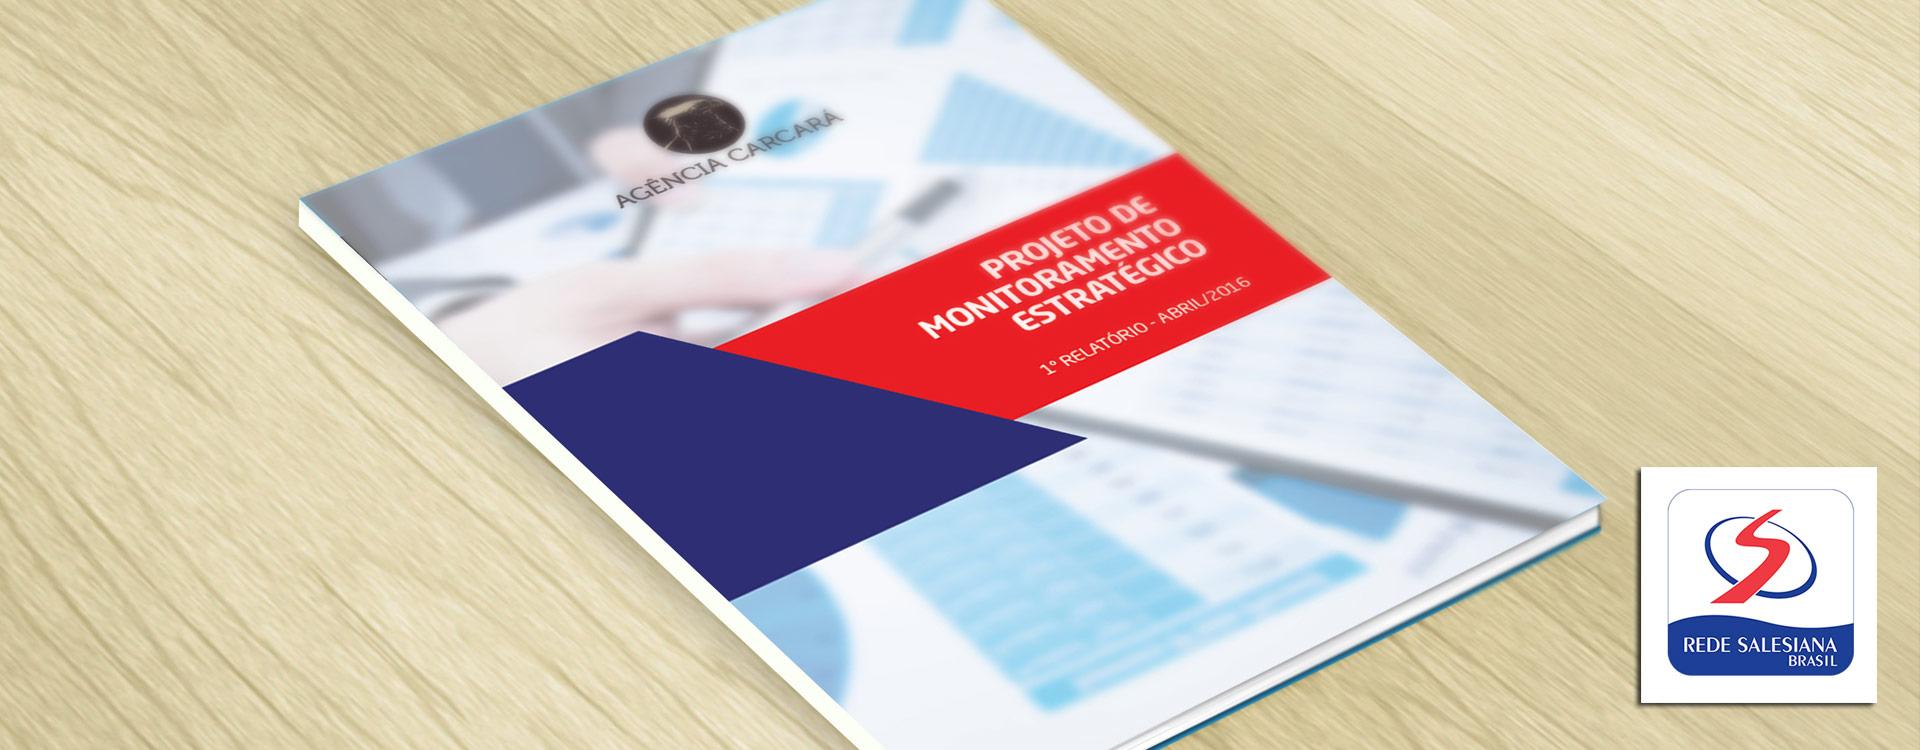 cliente-rede-salesiana-brasil-comunicacao-branding